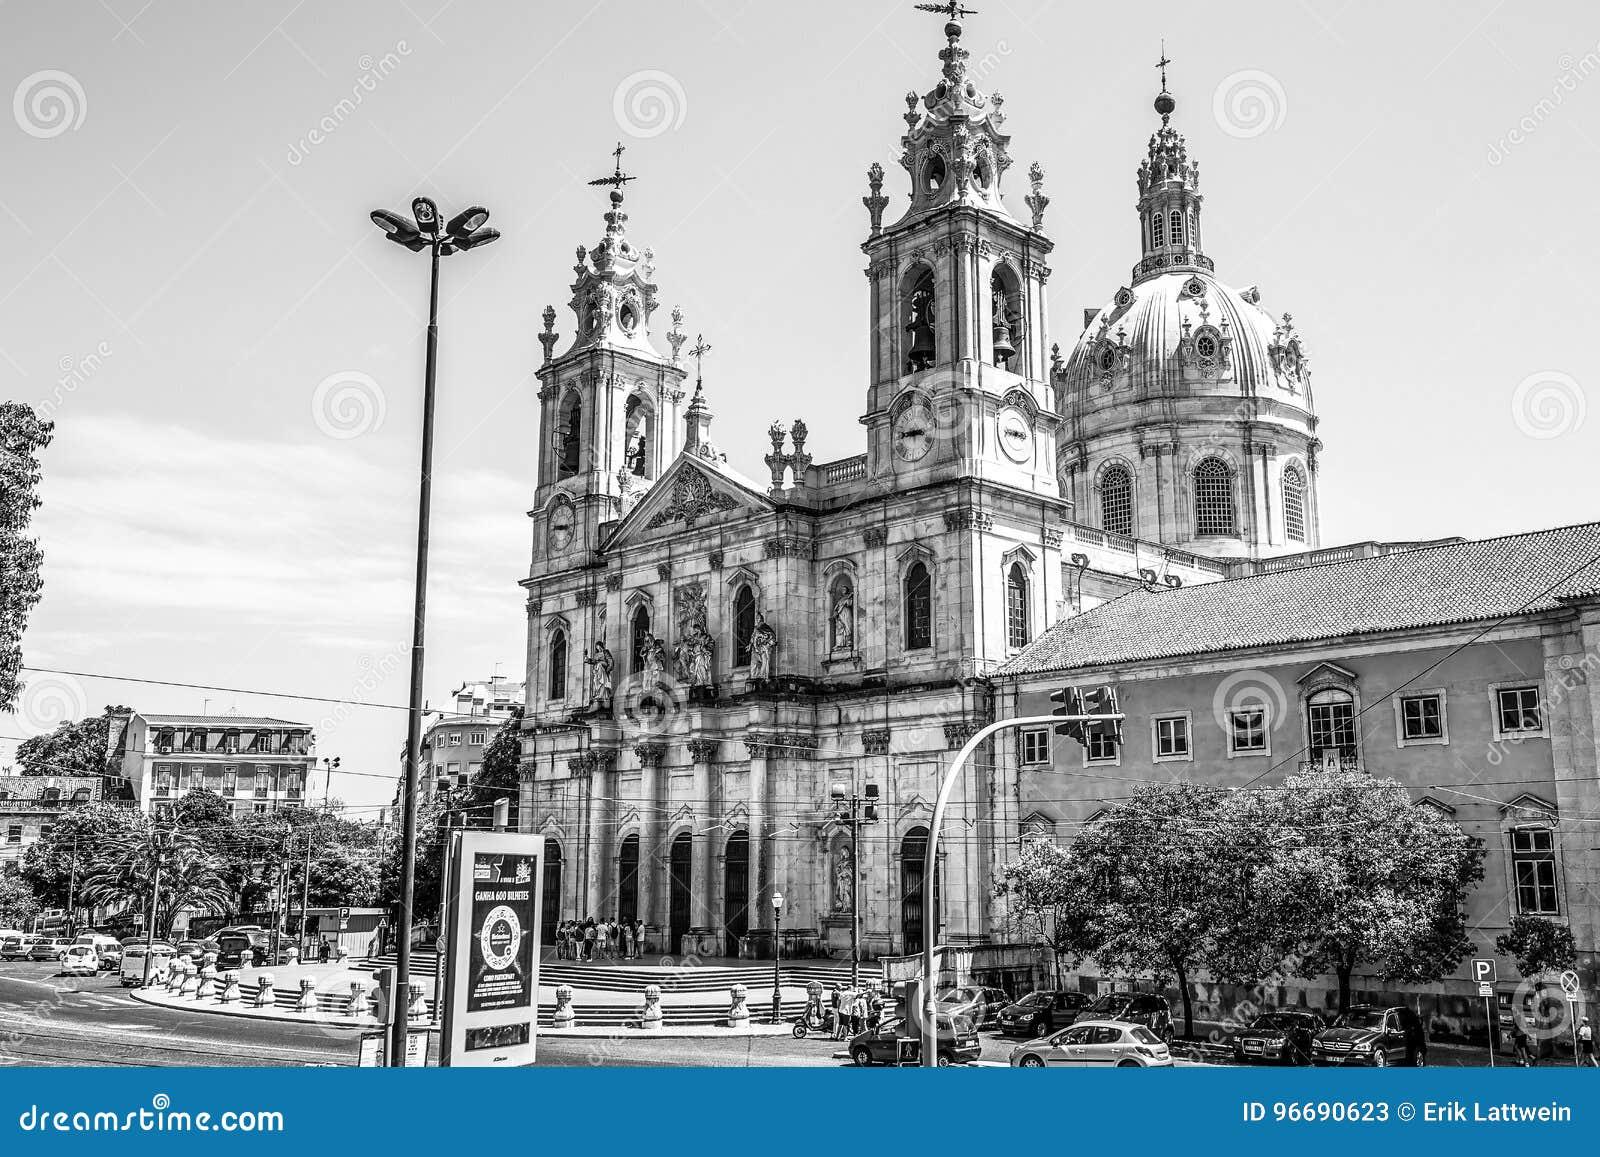 Famous Estrela Basilica in Lisbon - LISBON / PORTUGAL - JUNE 14, 2017